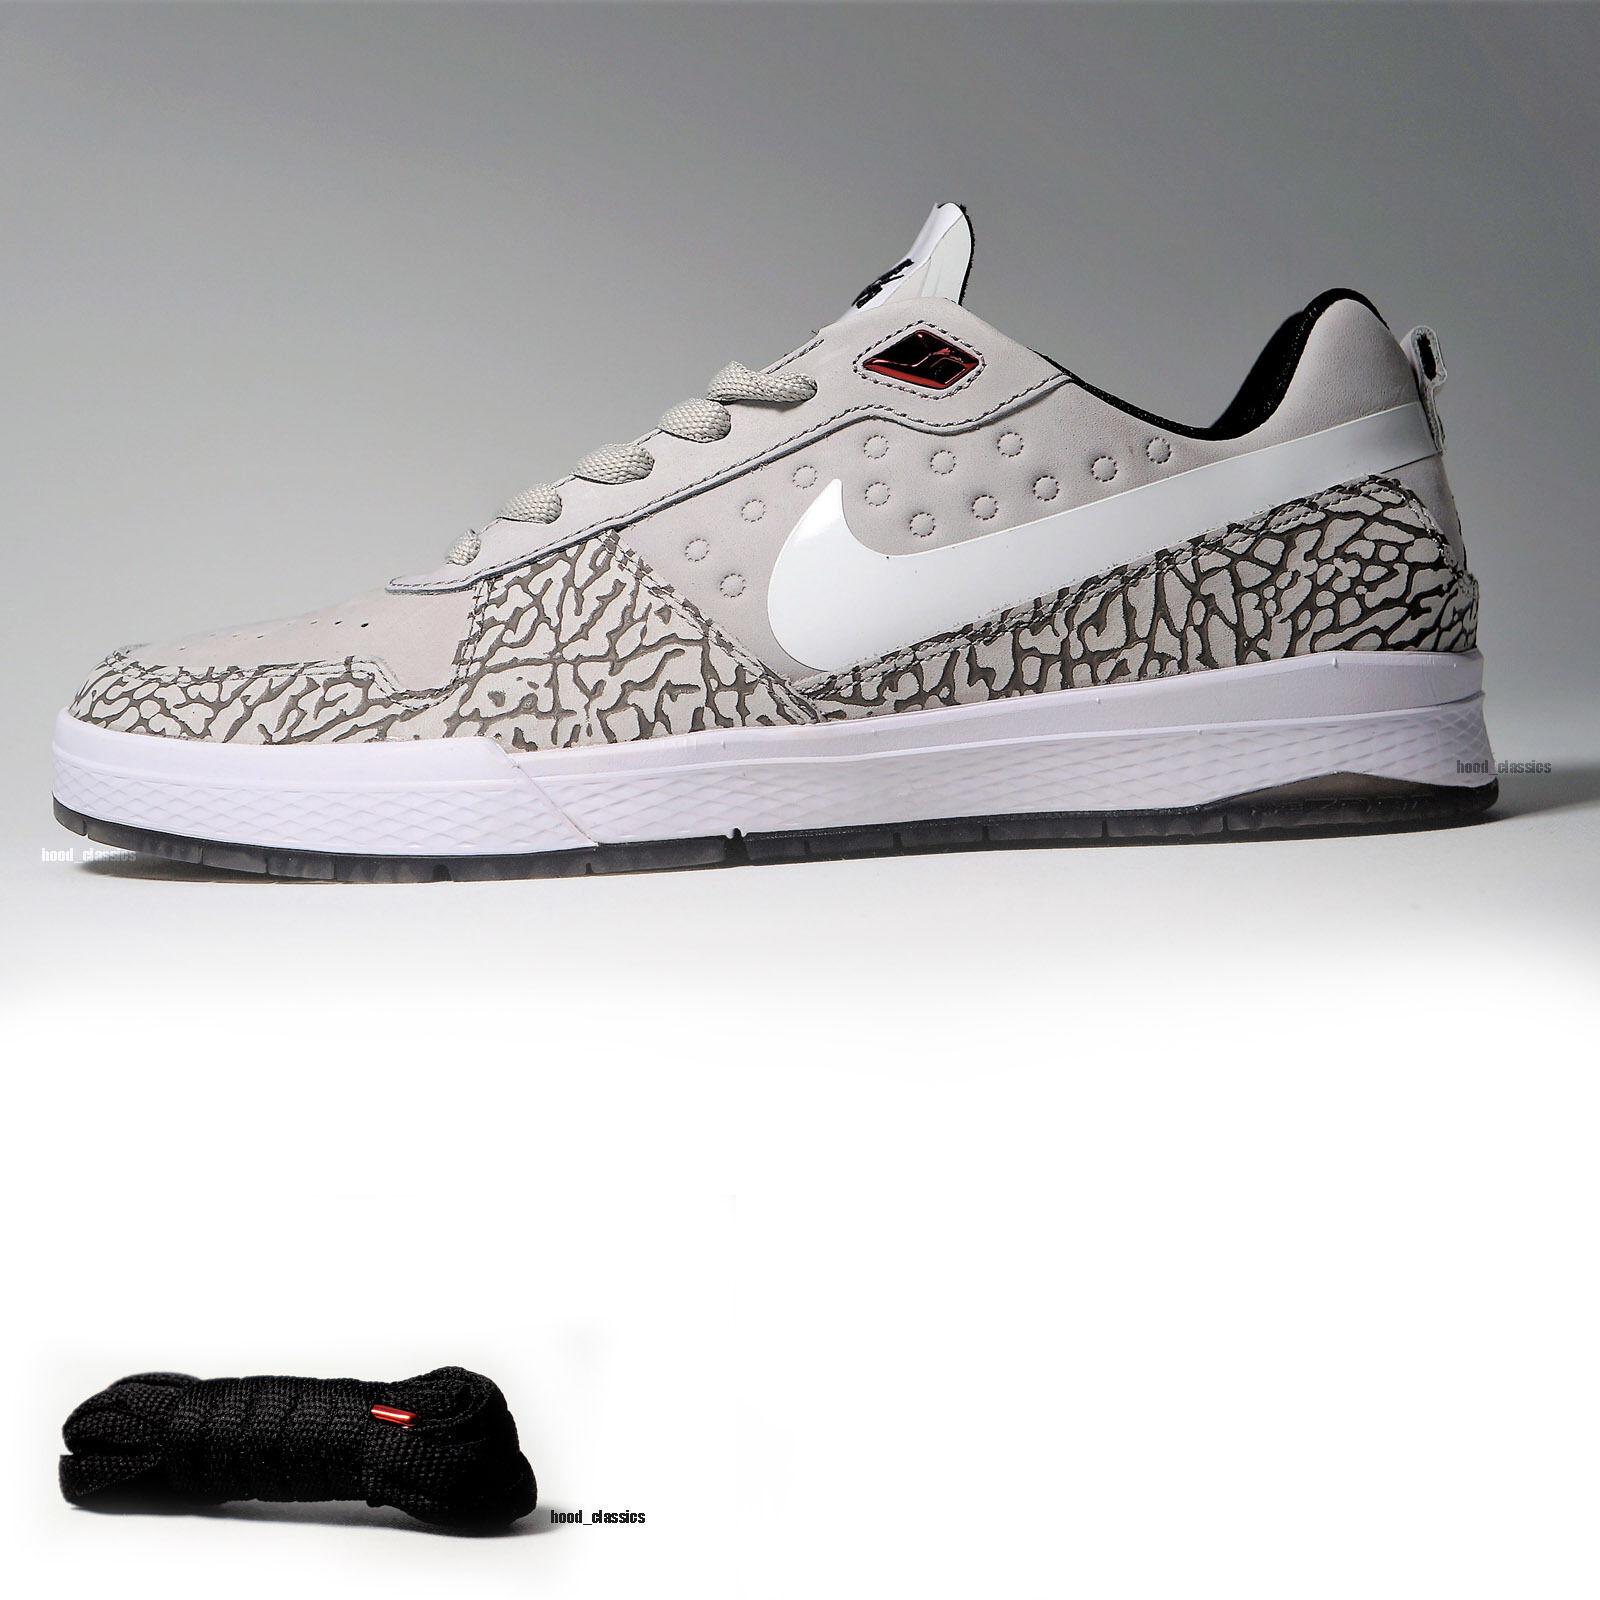 Nike jordan elite 9 j-rod retrò elefante impronta zoom air scarpe, scarpe da ginnastica